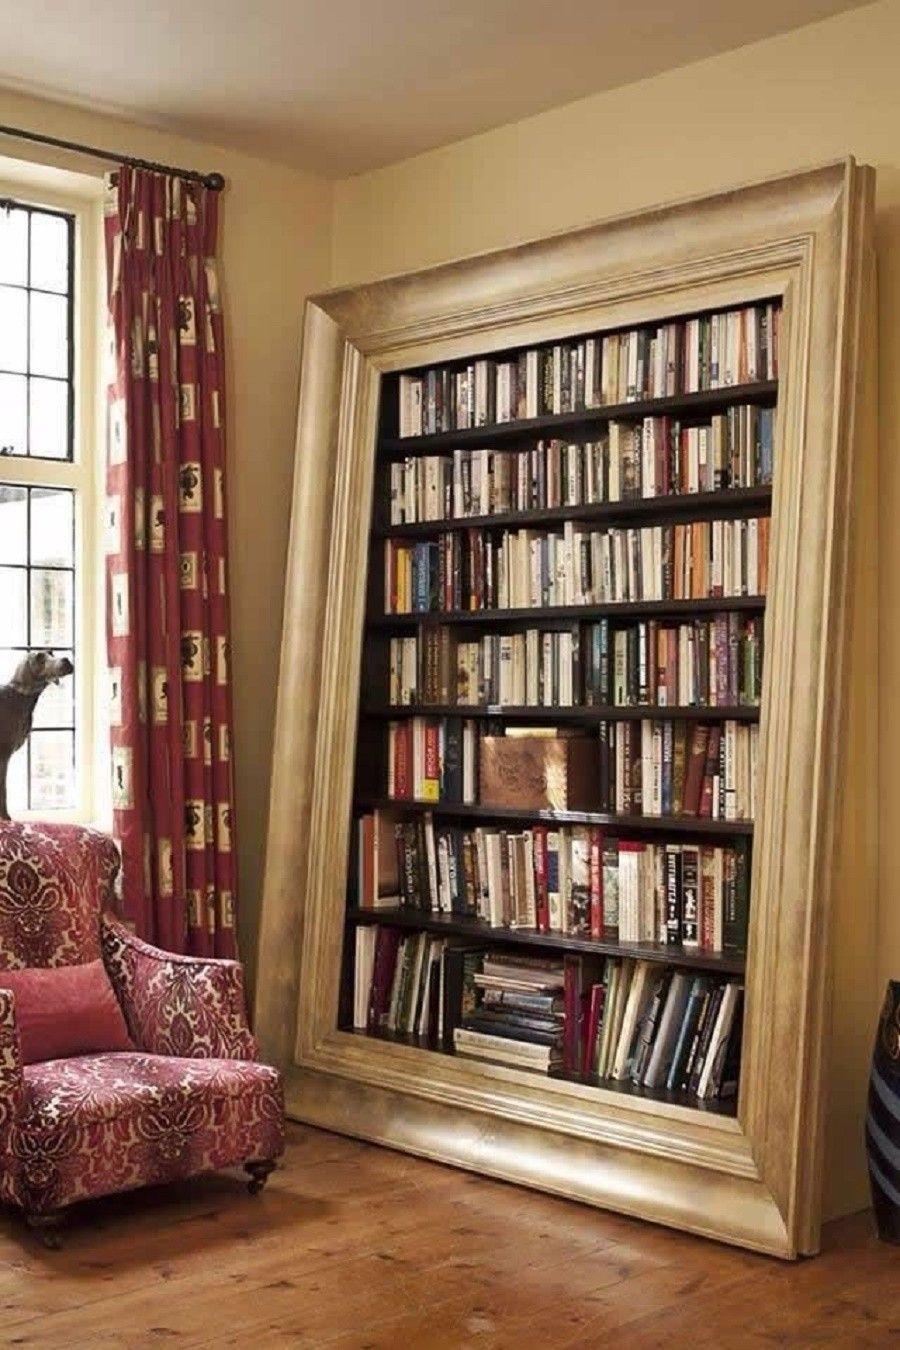 10 librerie dal design originale per arredare casa bigodino for Arredamento originale casa